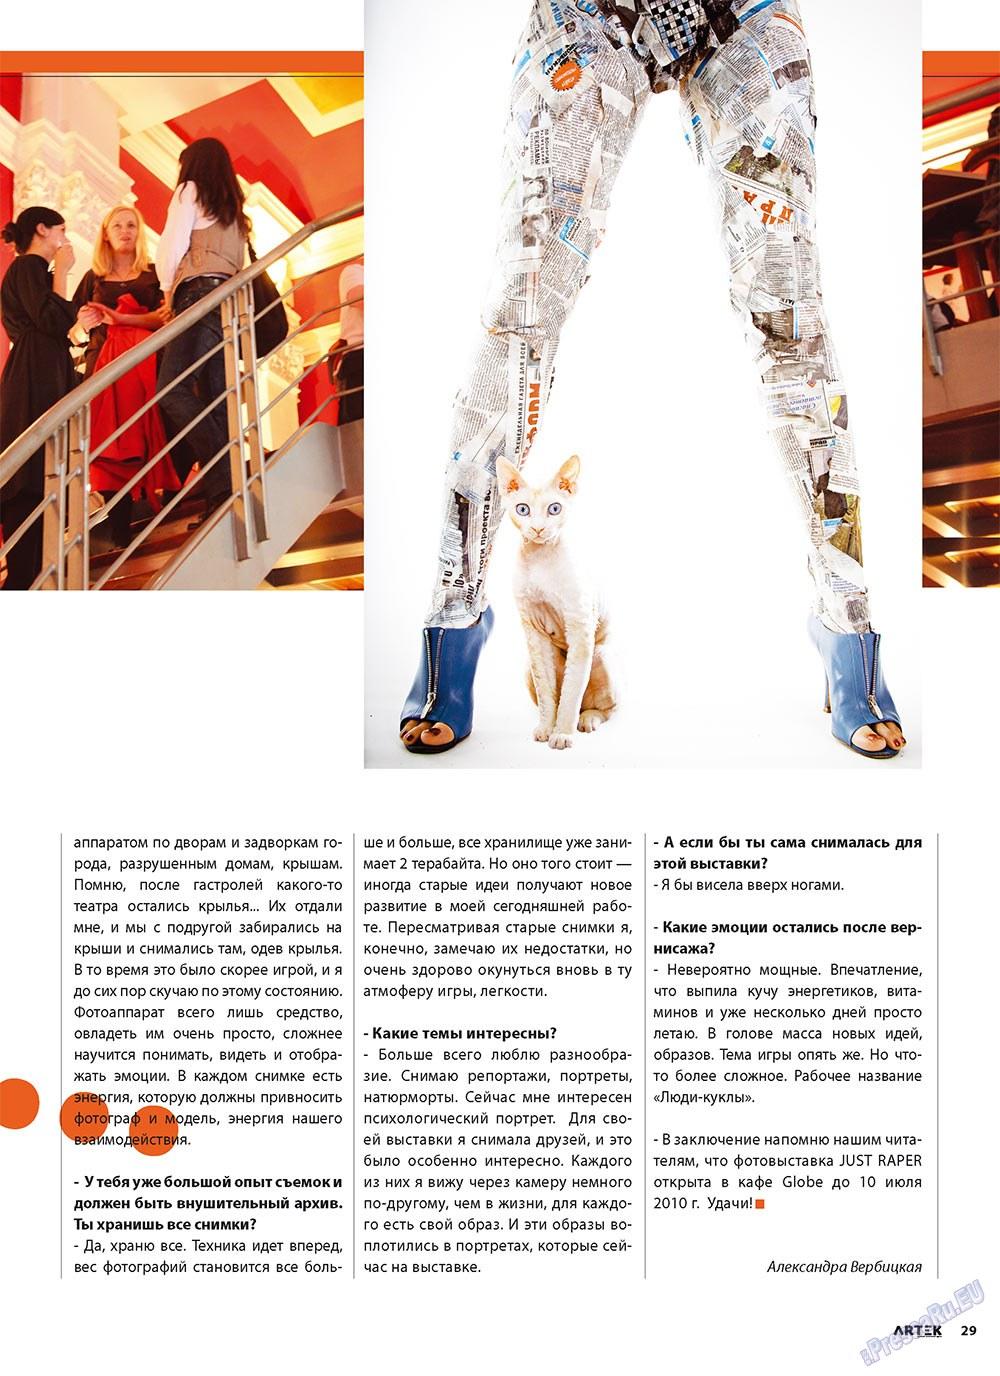 Артек (журнал). 2010 год, номер 3, стр. 31